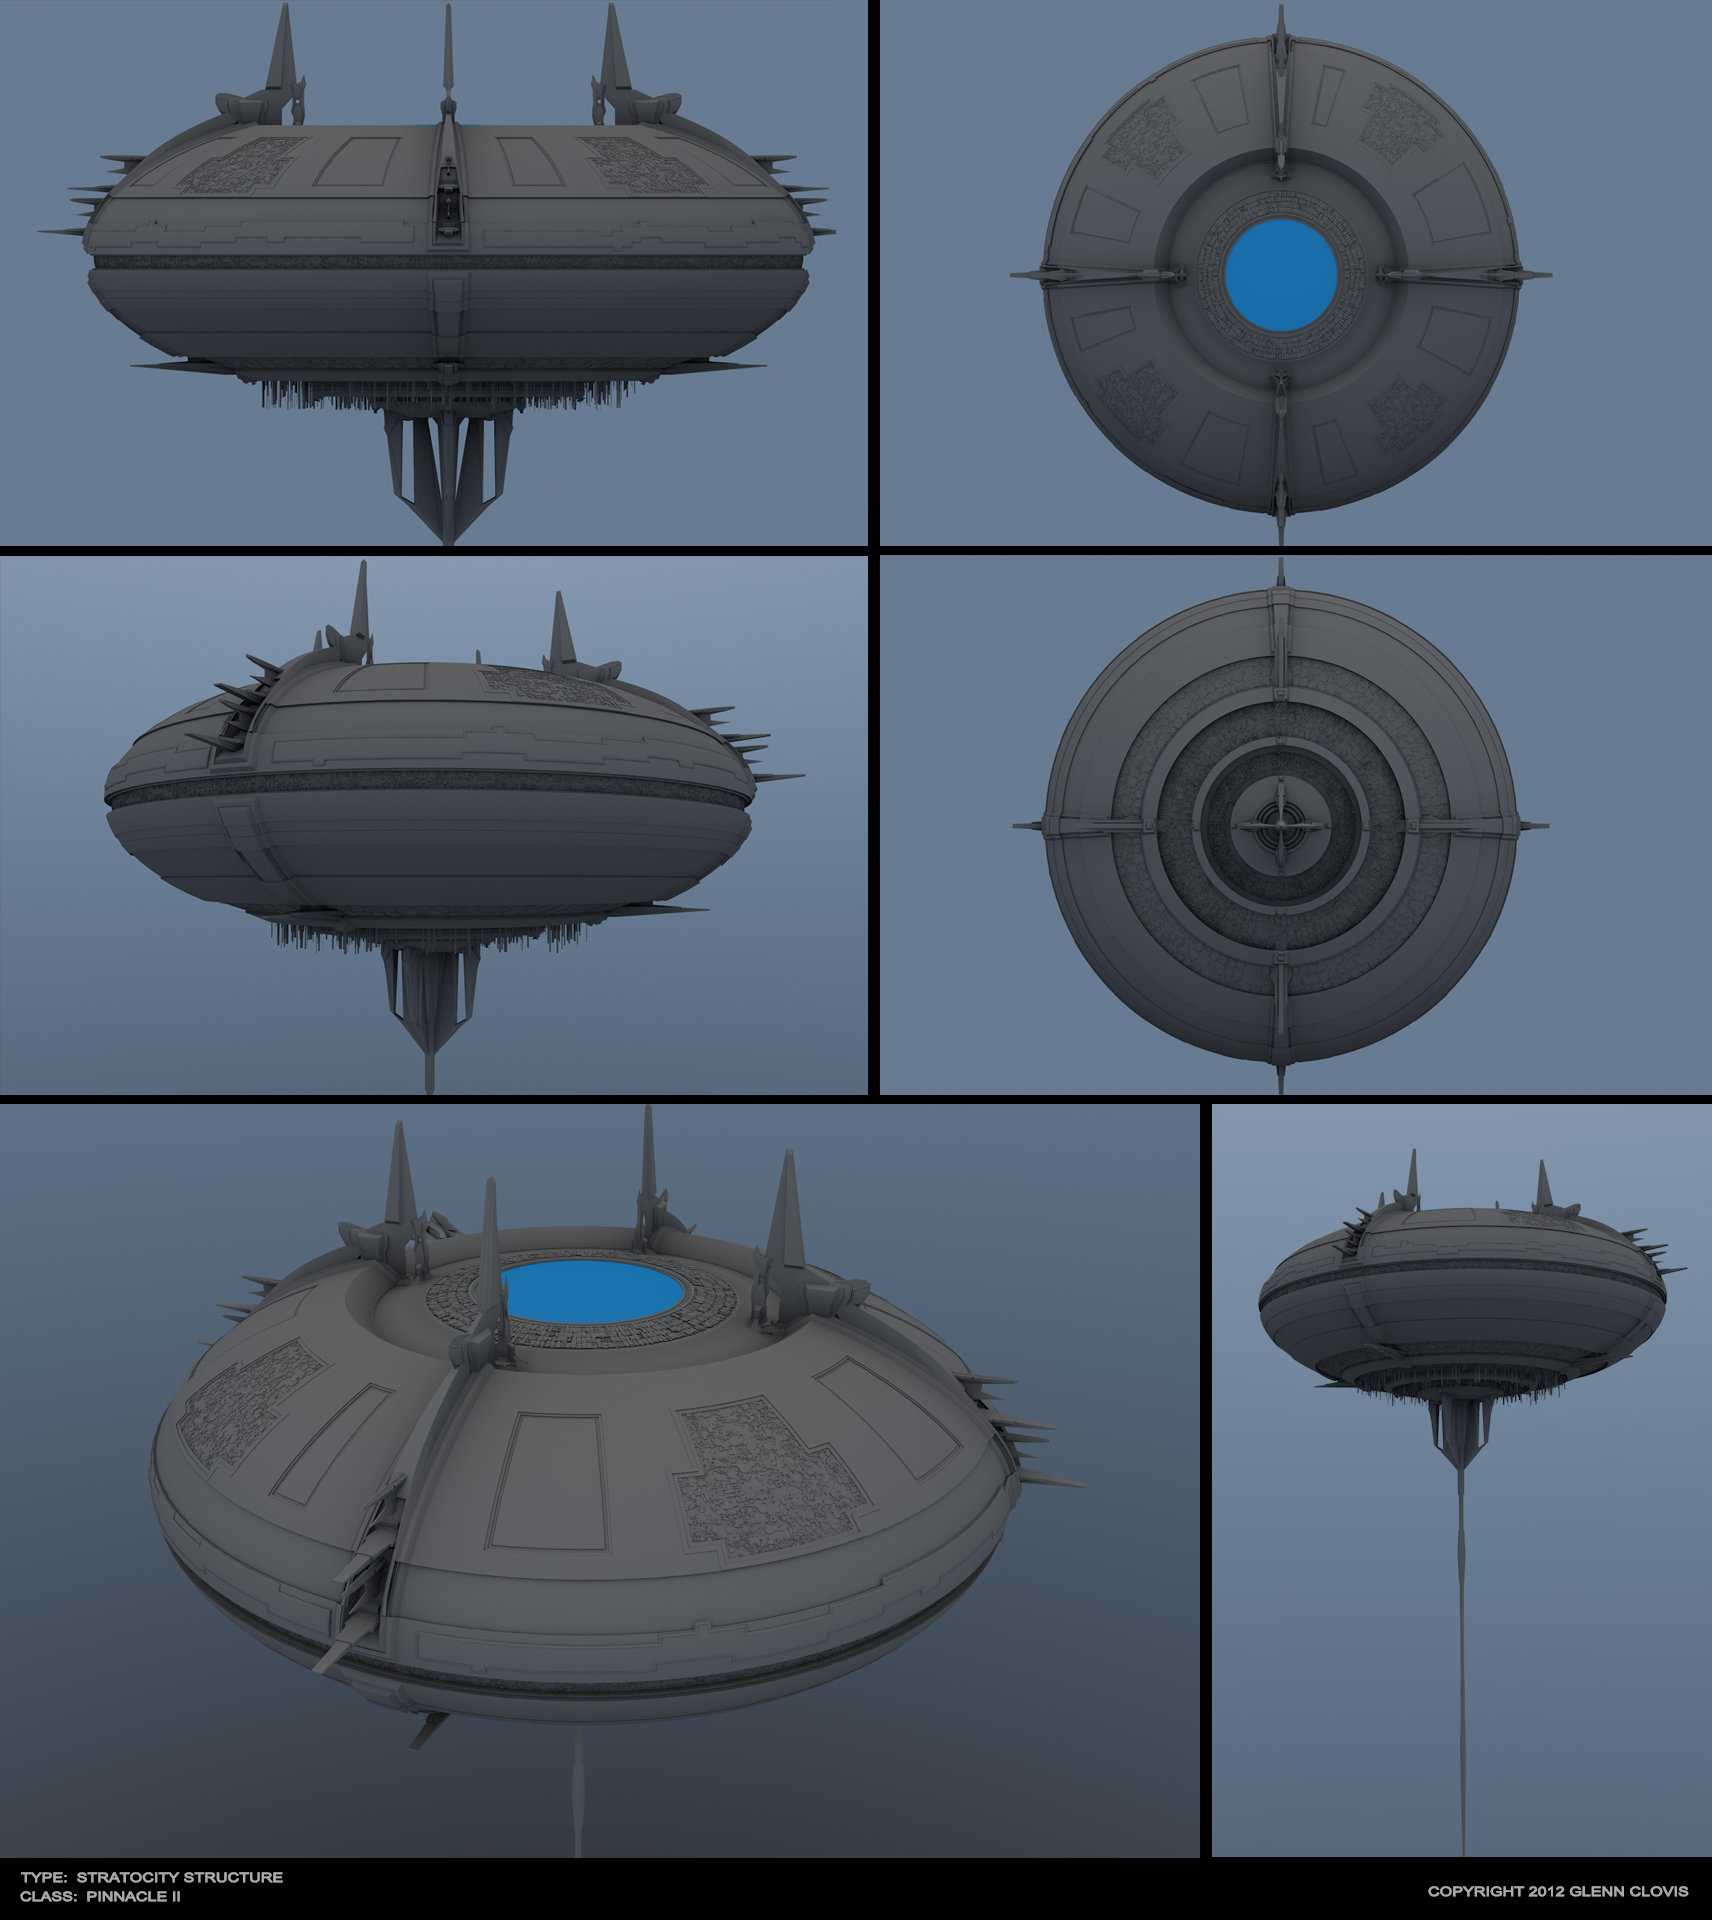 Glenn clovis model pinnacle station by tsarye d54kg1f